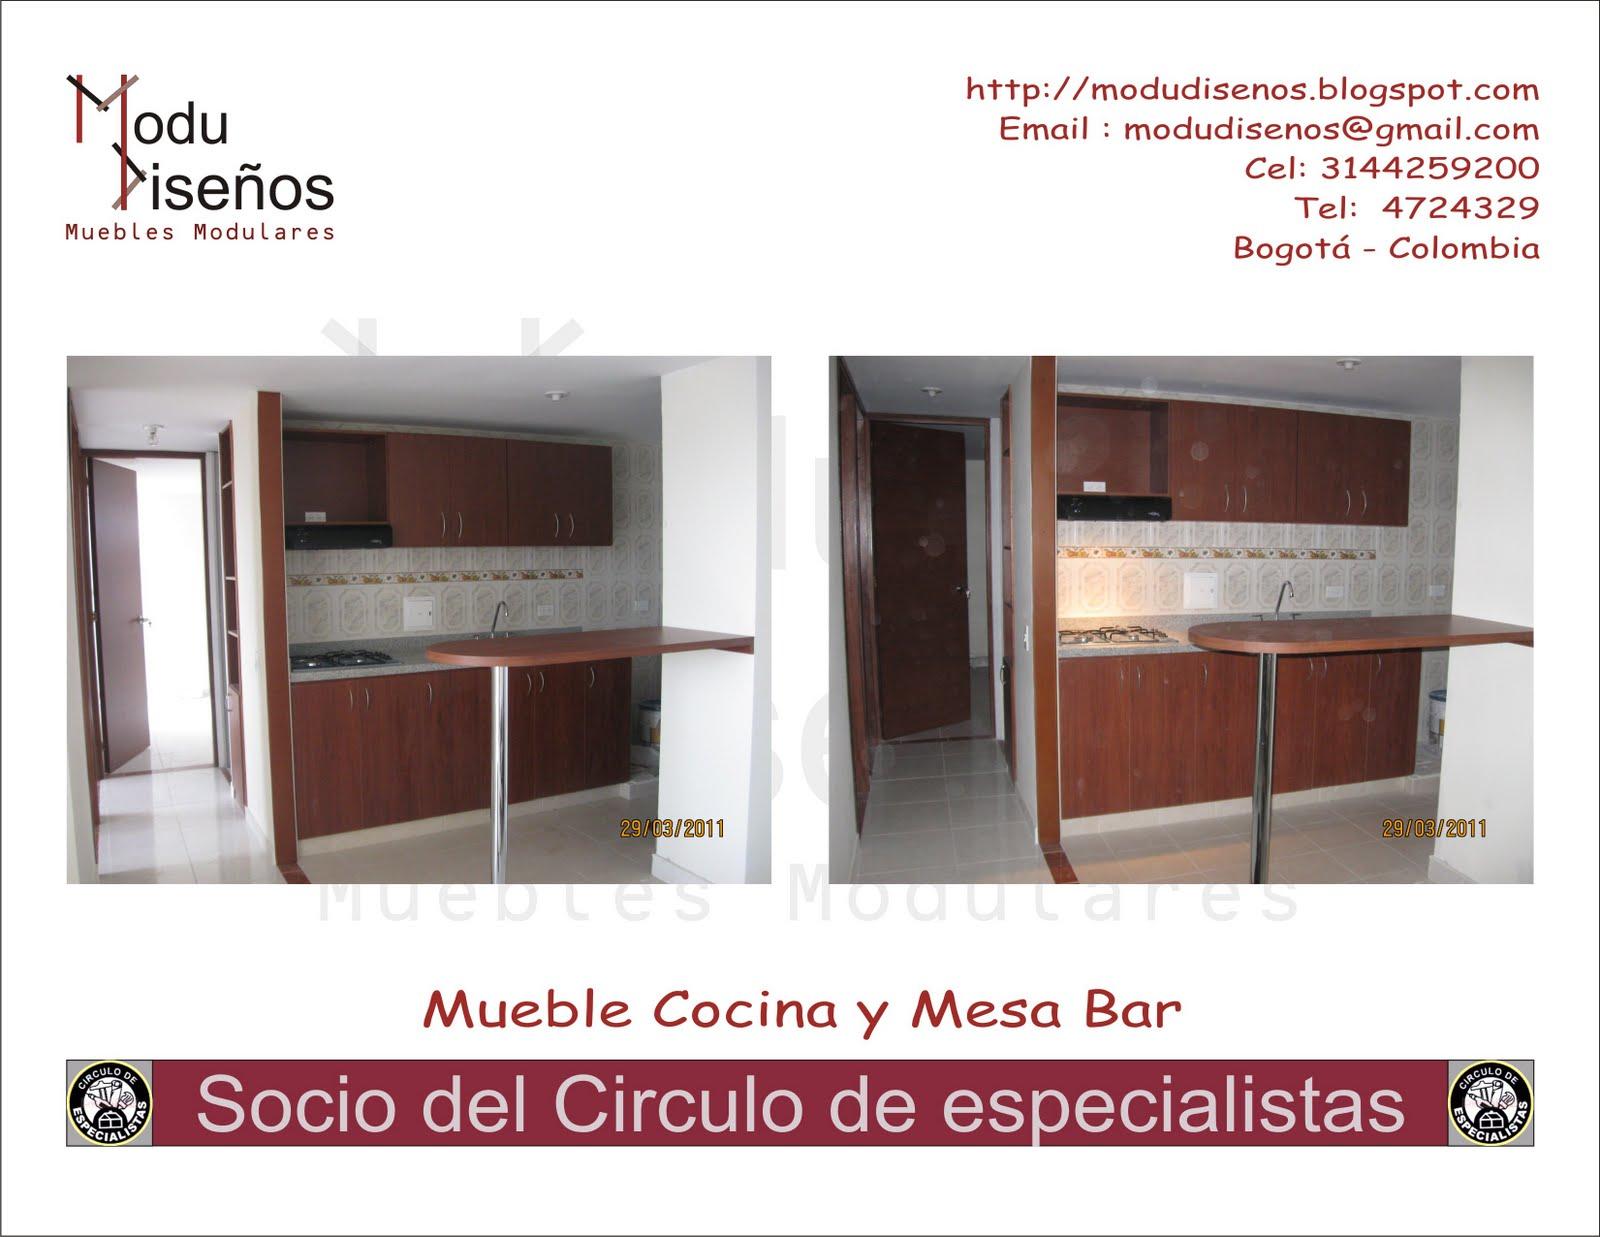 Modudise os mueble cocina y mesa bar - Mueble mesa cocina ...